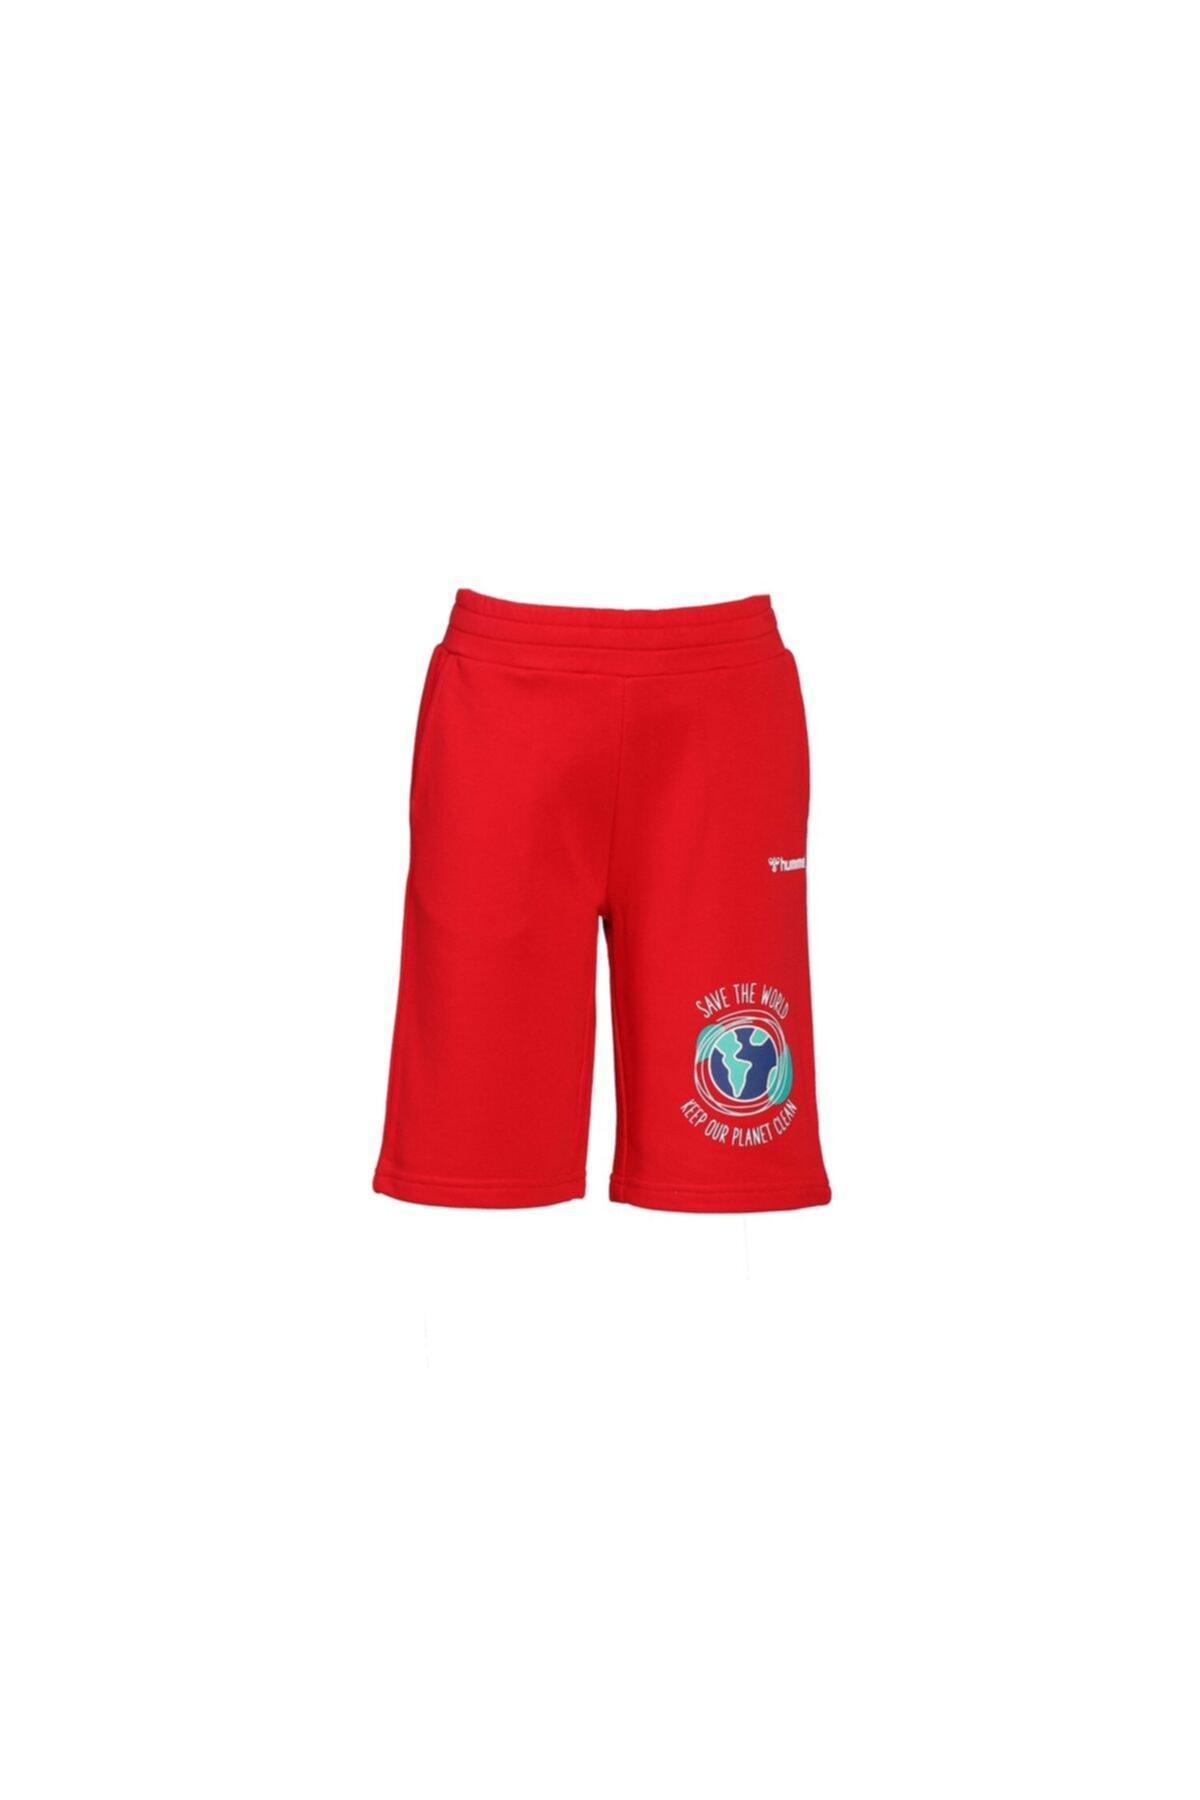 HUMMEL Bosley Çocuk Shorts 1